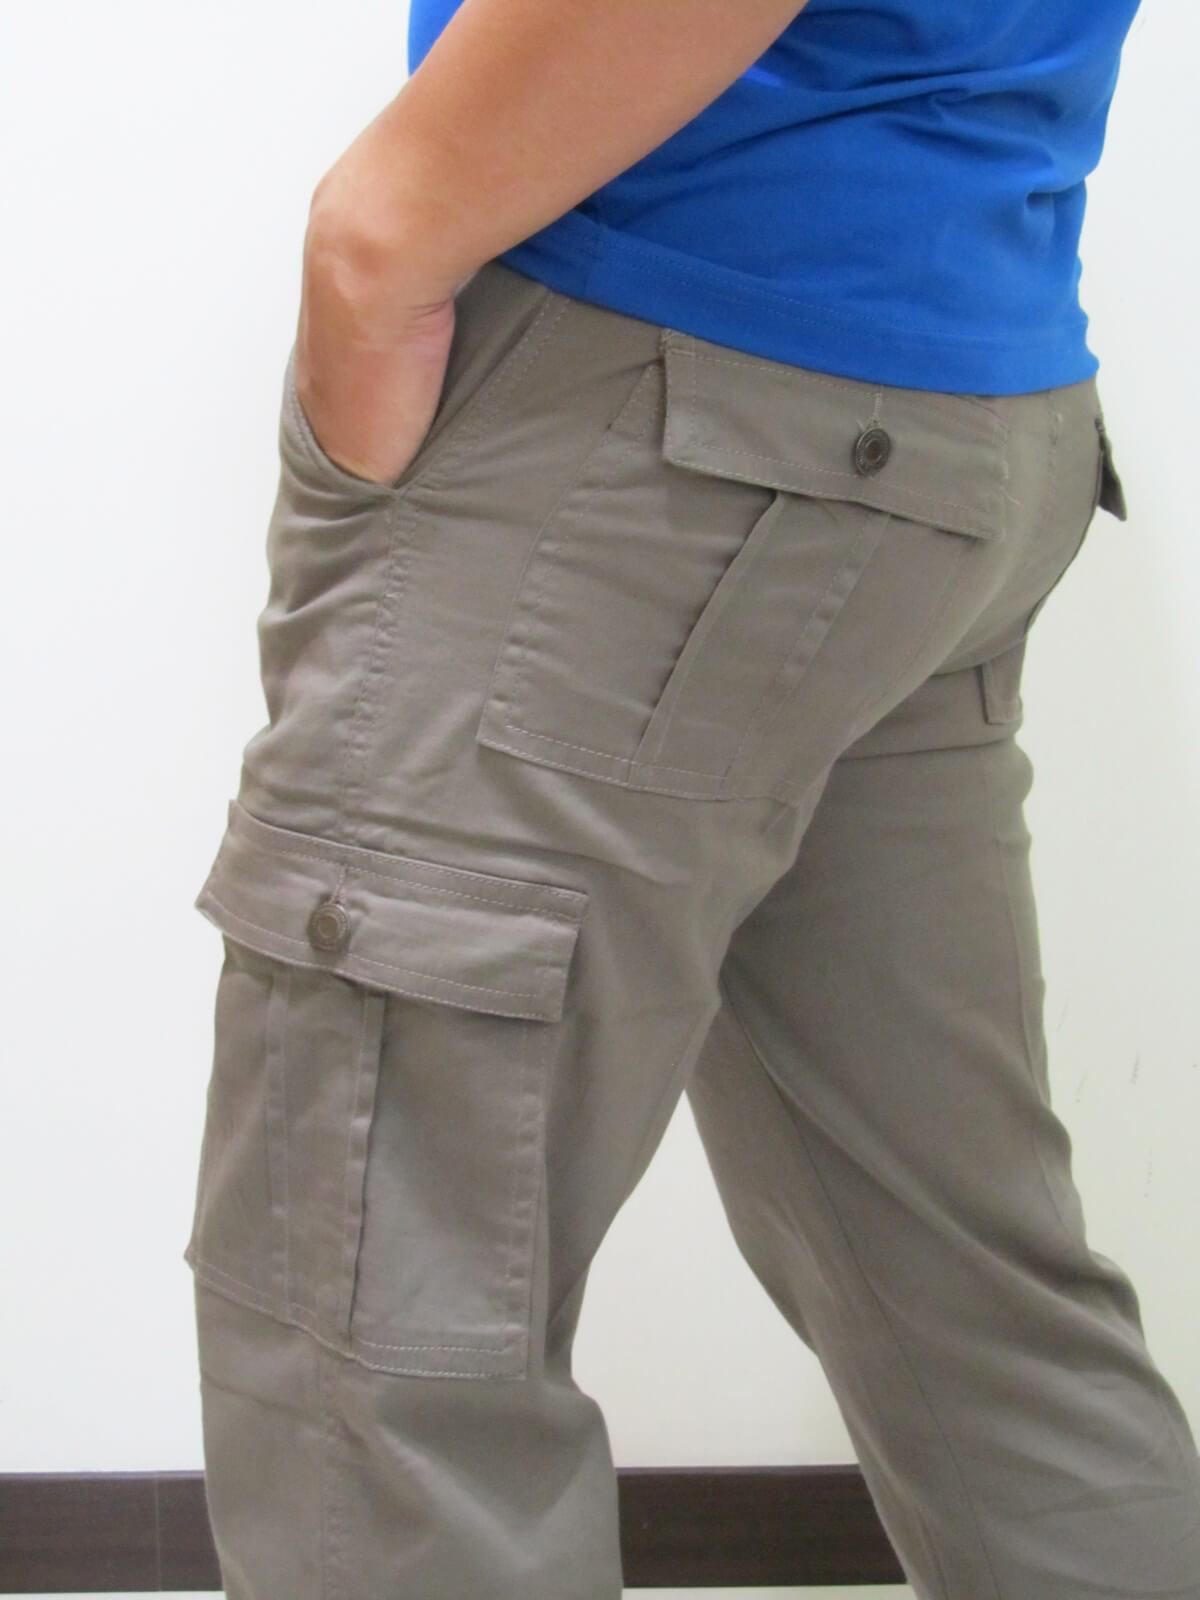 sun-e超輕薄休閒長褲、側貼袋工作褲、多口袋休閒長褲、伸縮中直筒休閒長褲(307-7006-16)卡其 腰圍:M L XL LL 3L 4L 5L(28~41英吋) 2